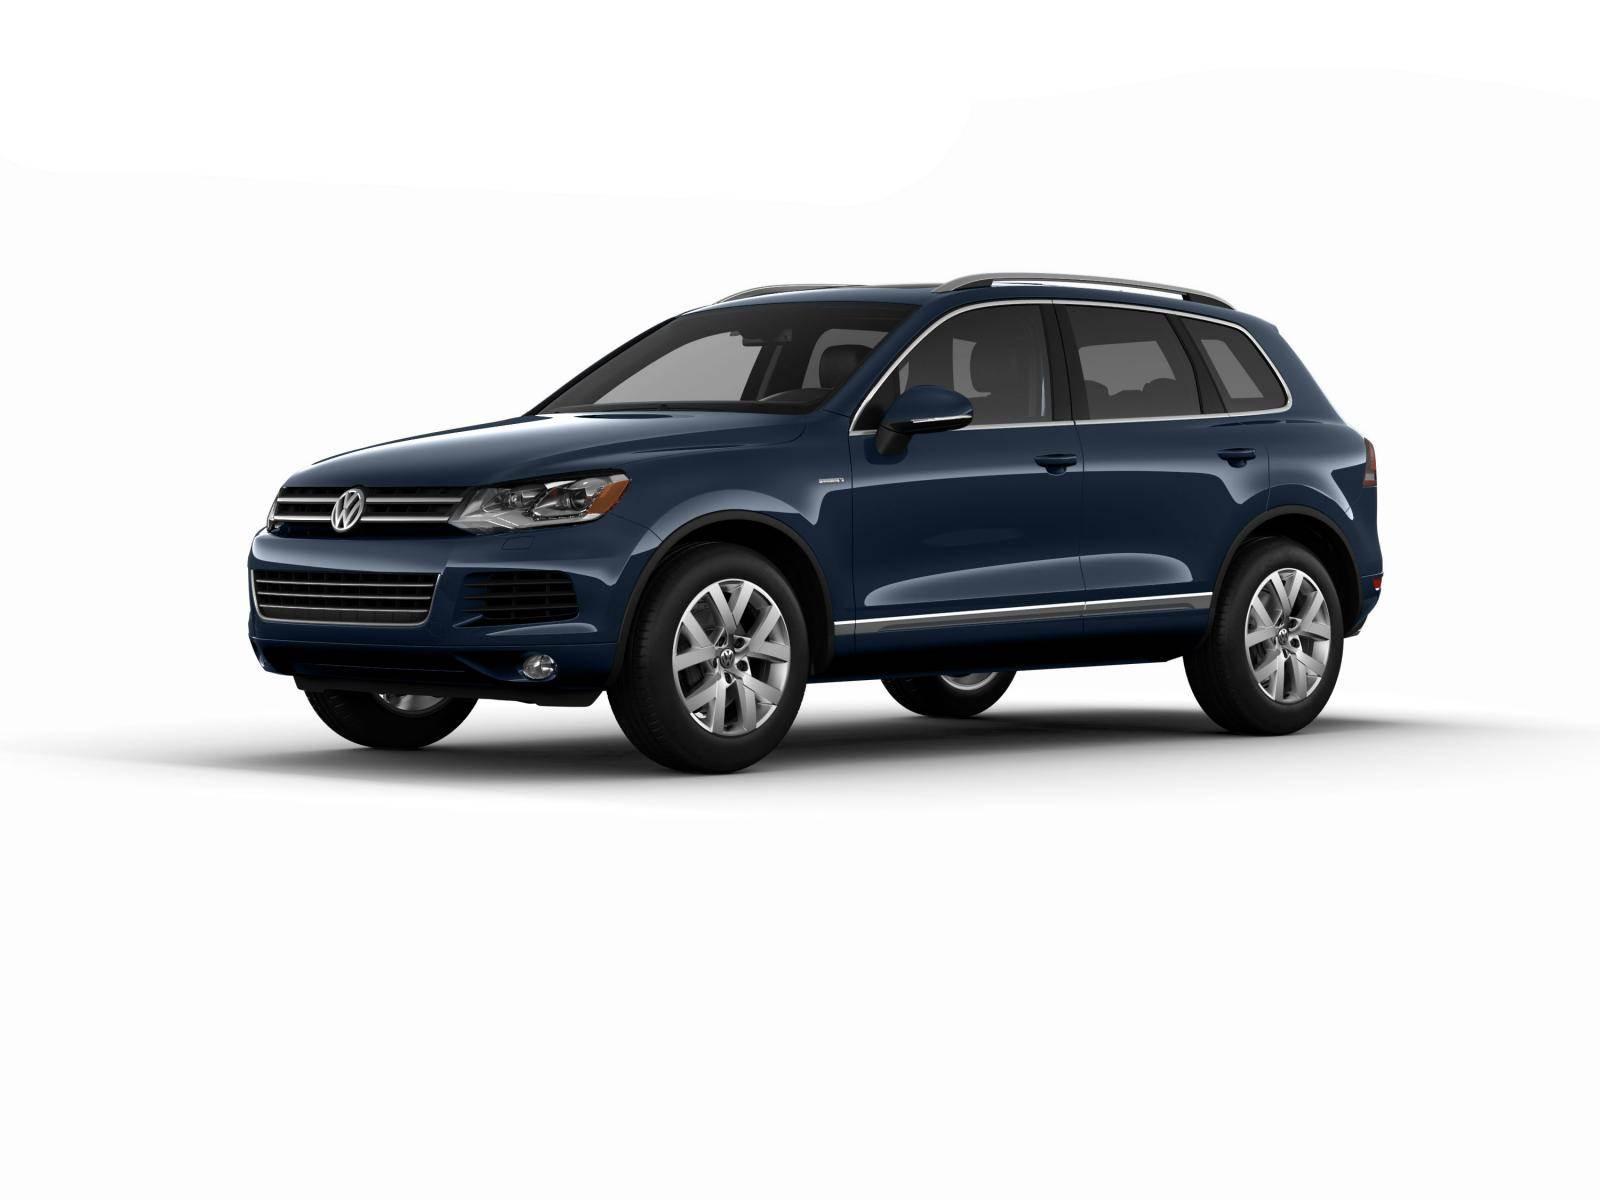 Volkswagen announces special edition Touareg X